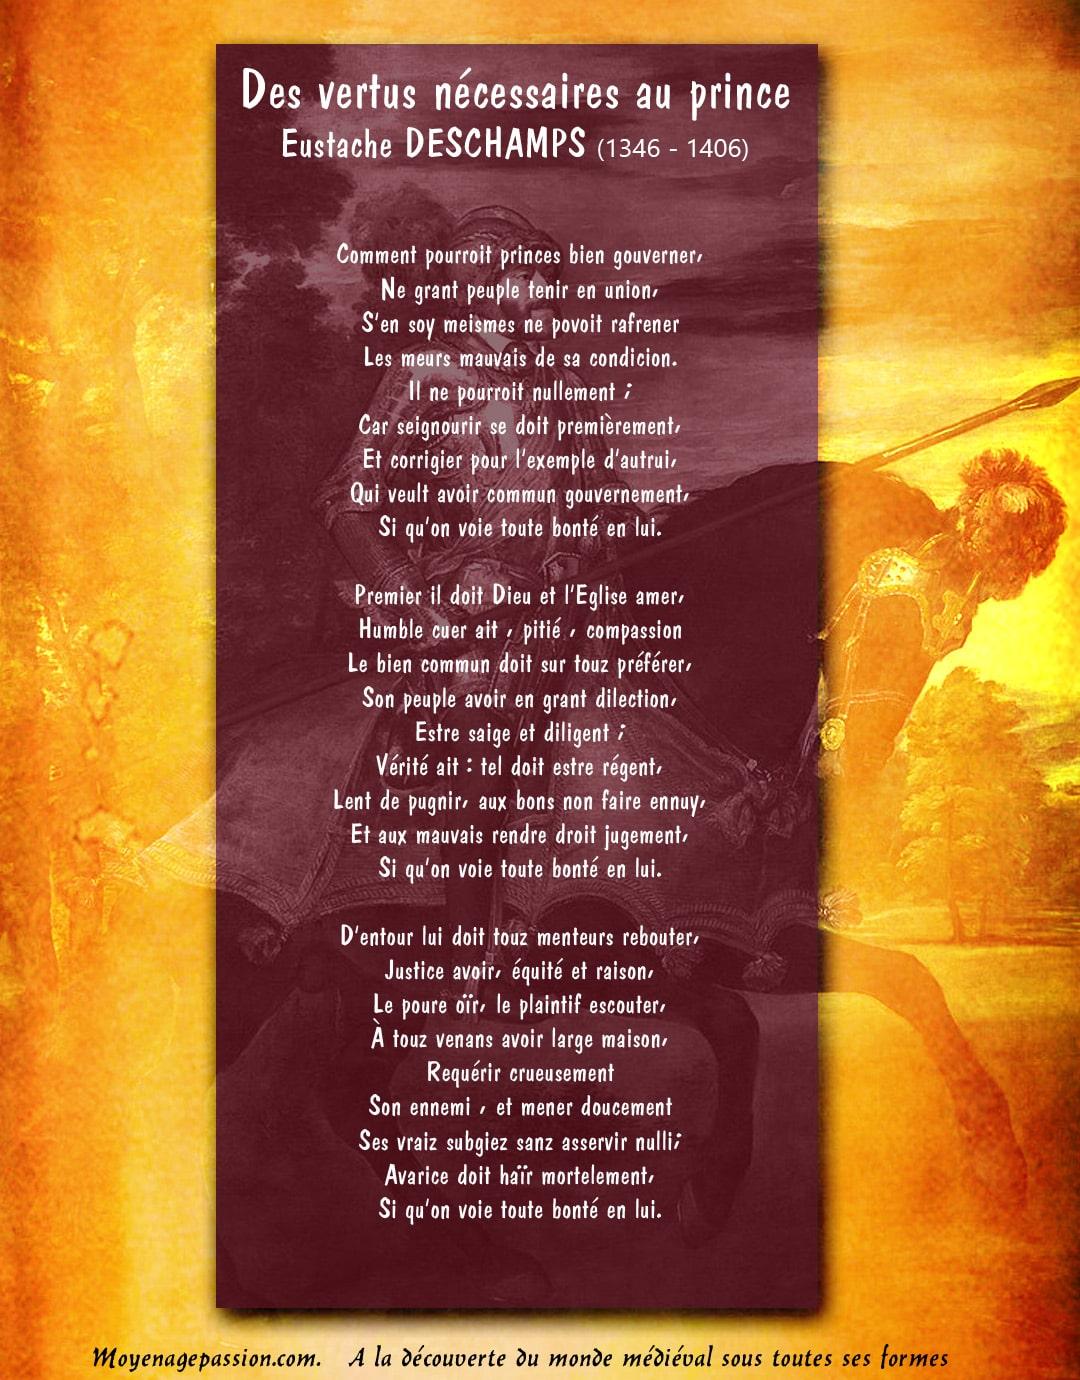 poesie_politique_satirique_medievale_litterature_ballade_prince_pouvoir_eustache_deschamps_moyen-age_tardif